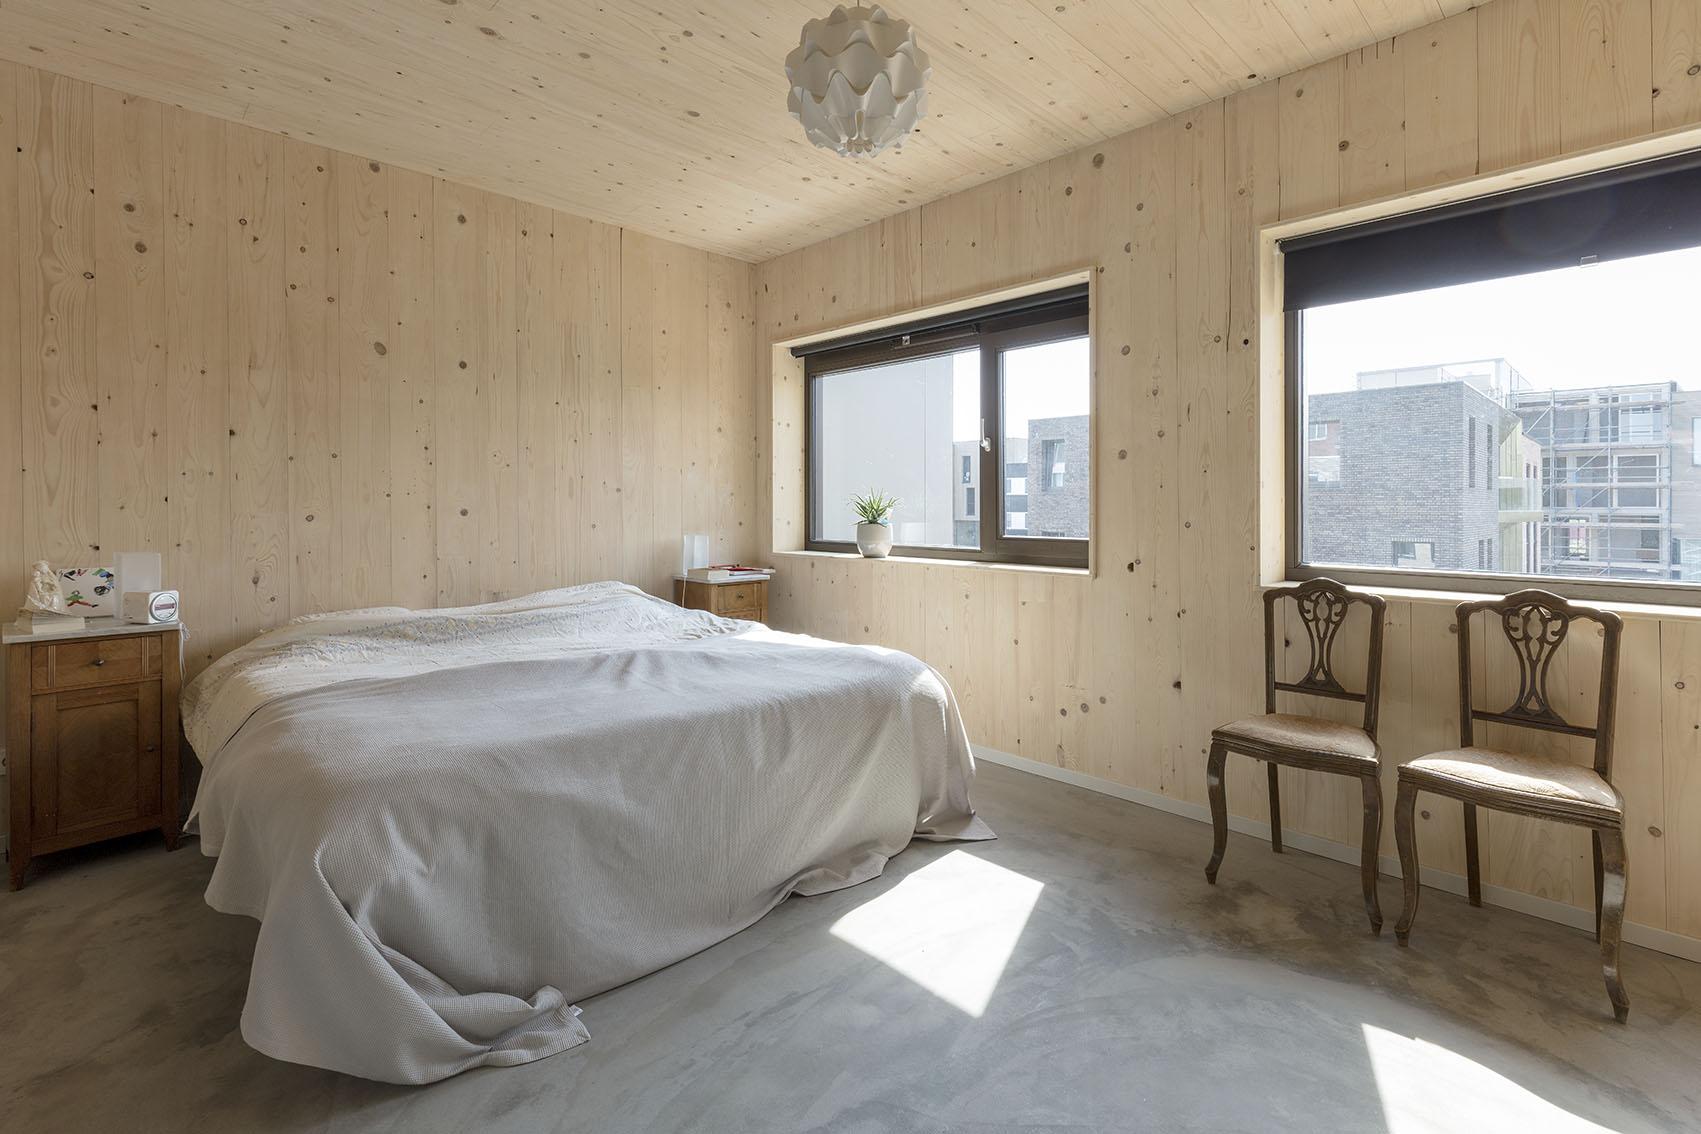 <p>Kavel 8 – slaapkamer foto: Marcel van der Burg</p>